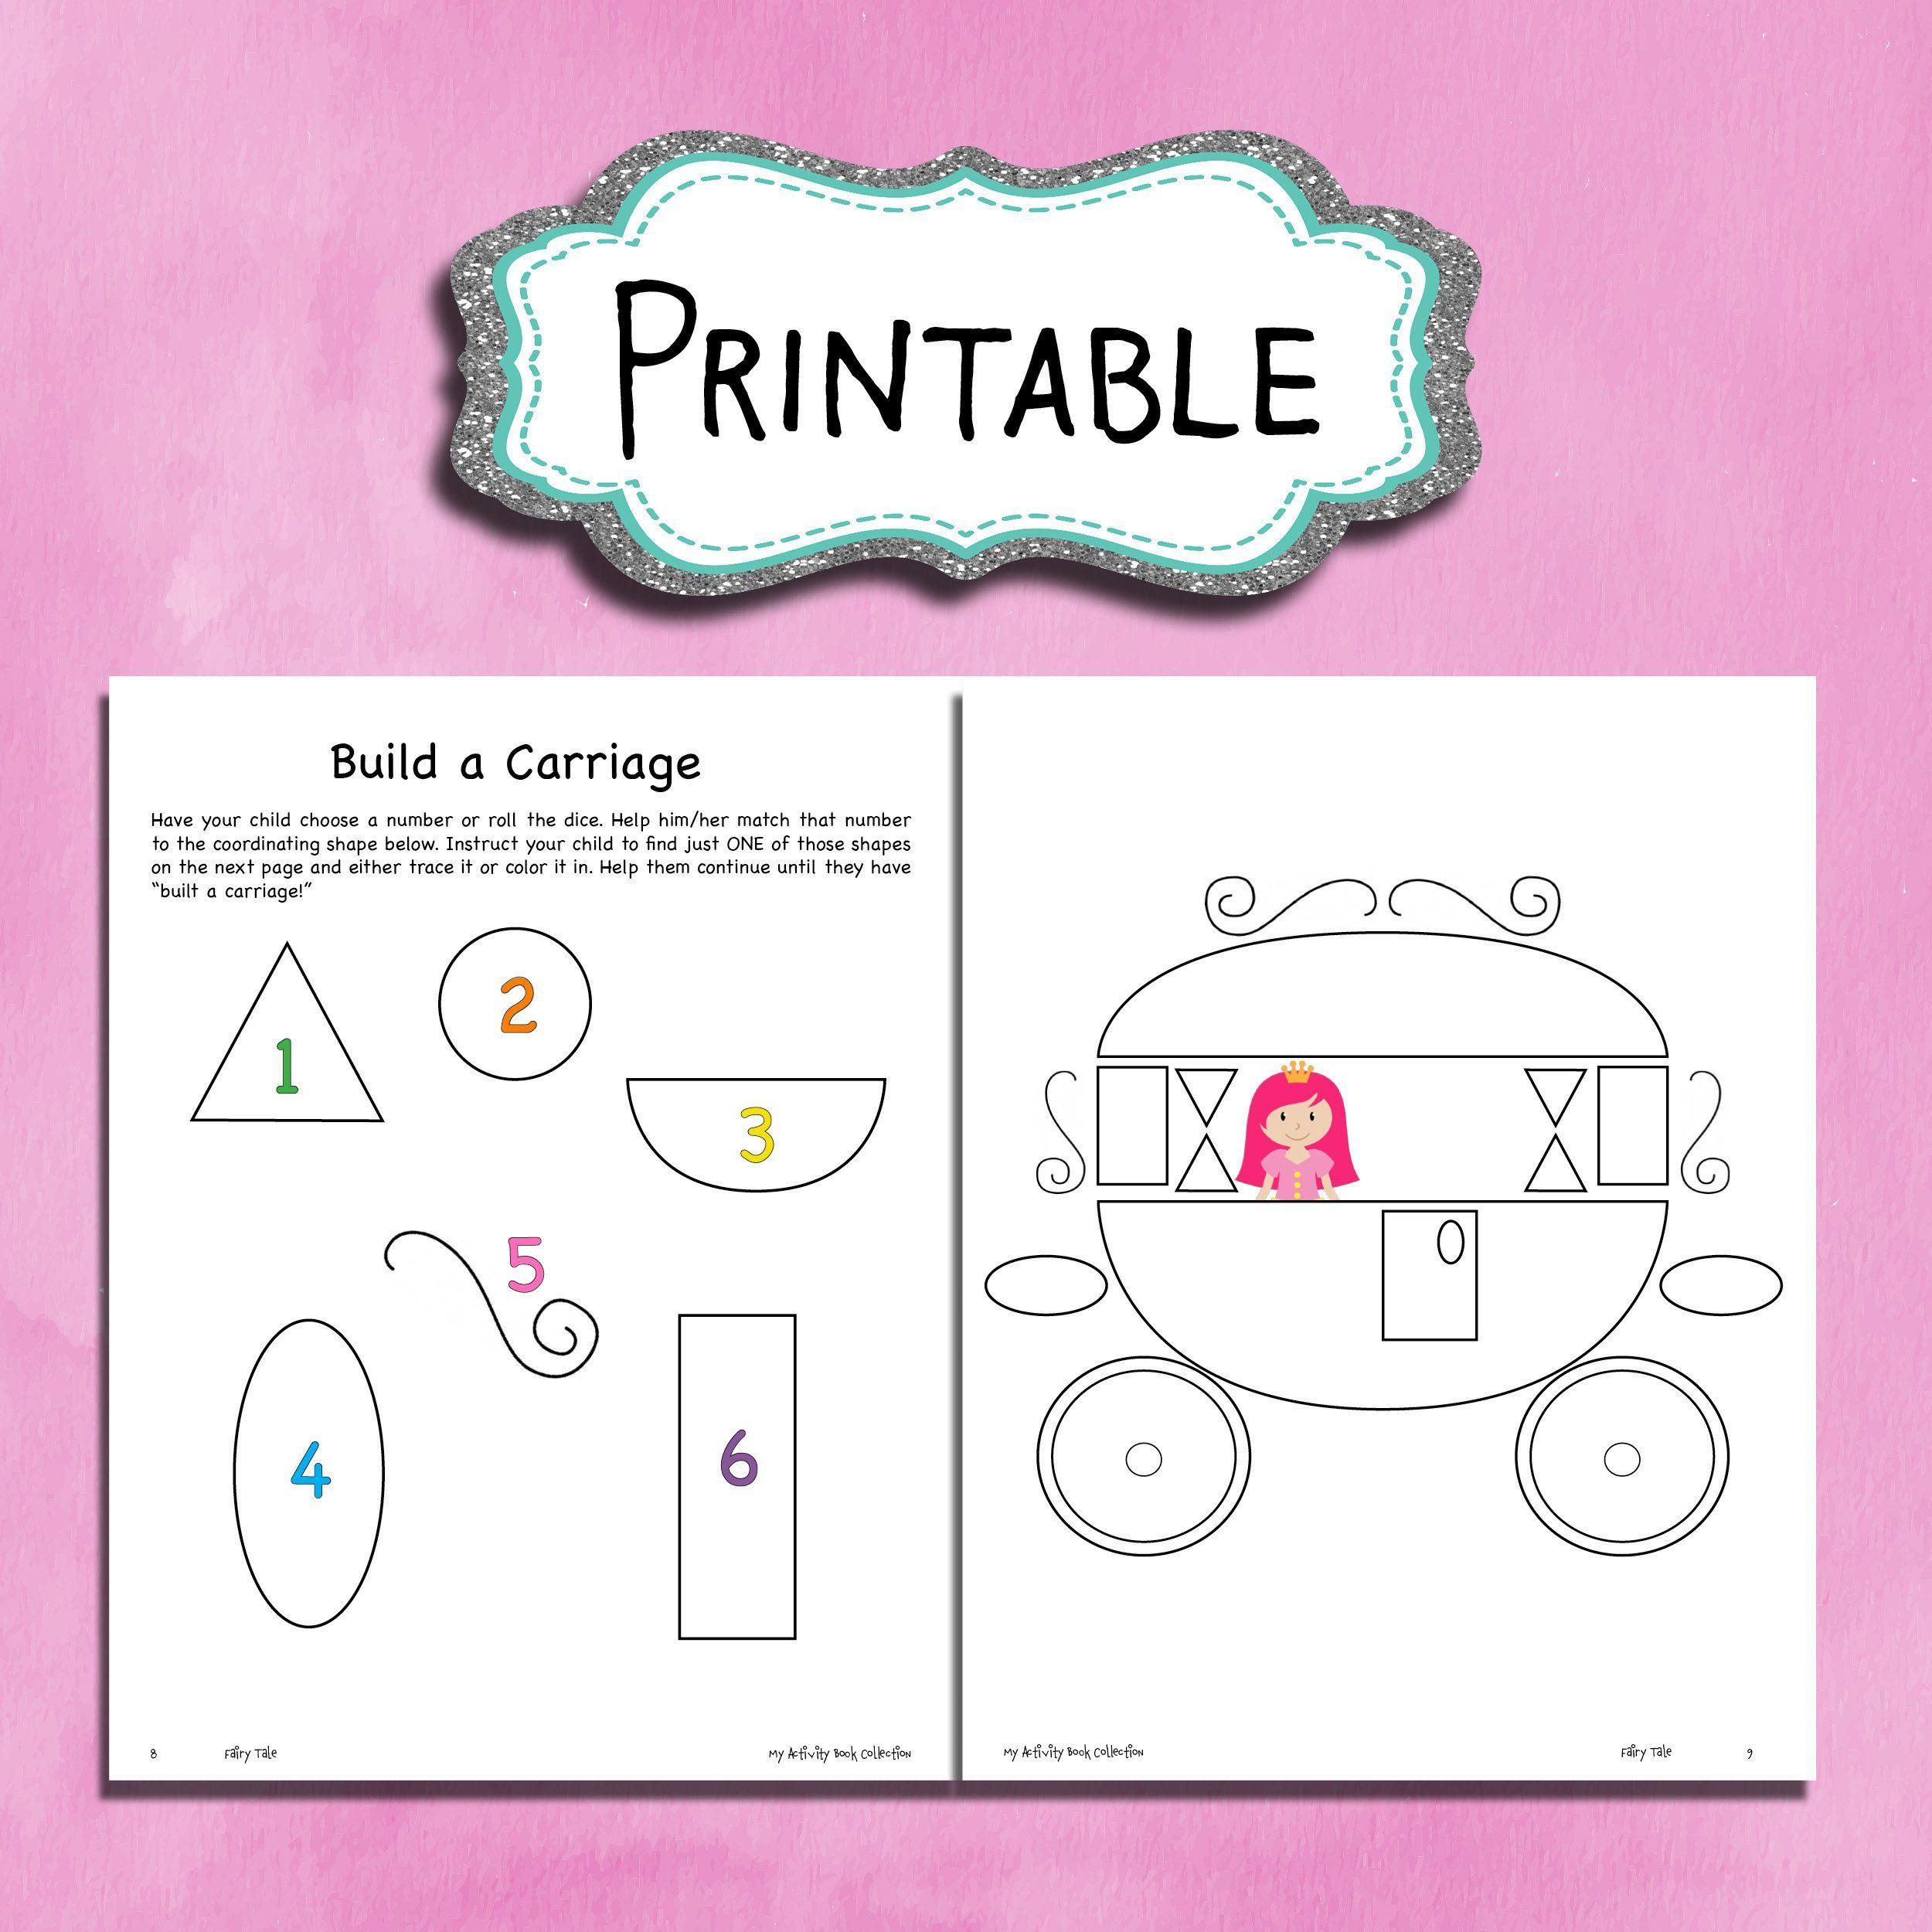 Build A Carriage Printable Worksheet For Kids Princess